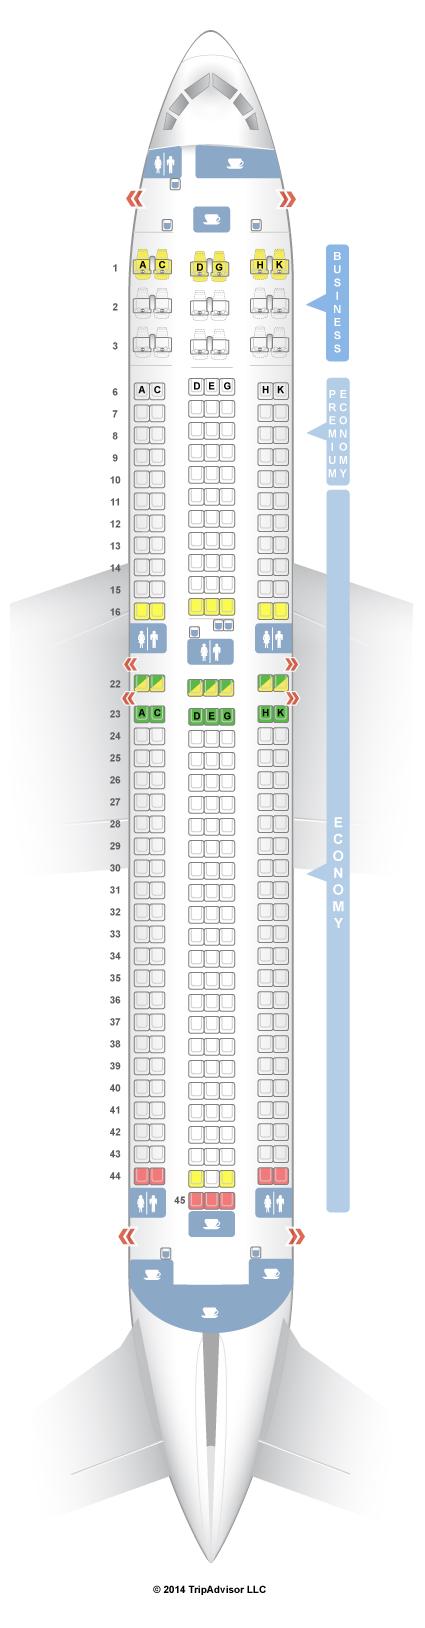 Seatguru seat map condor boeing er  air canada flights also best images commercial aircraft ride aviation rh pinterest